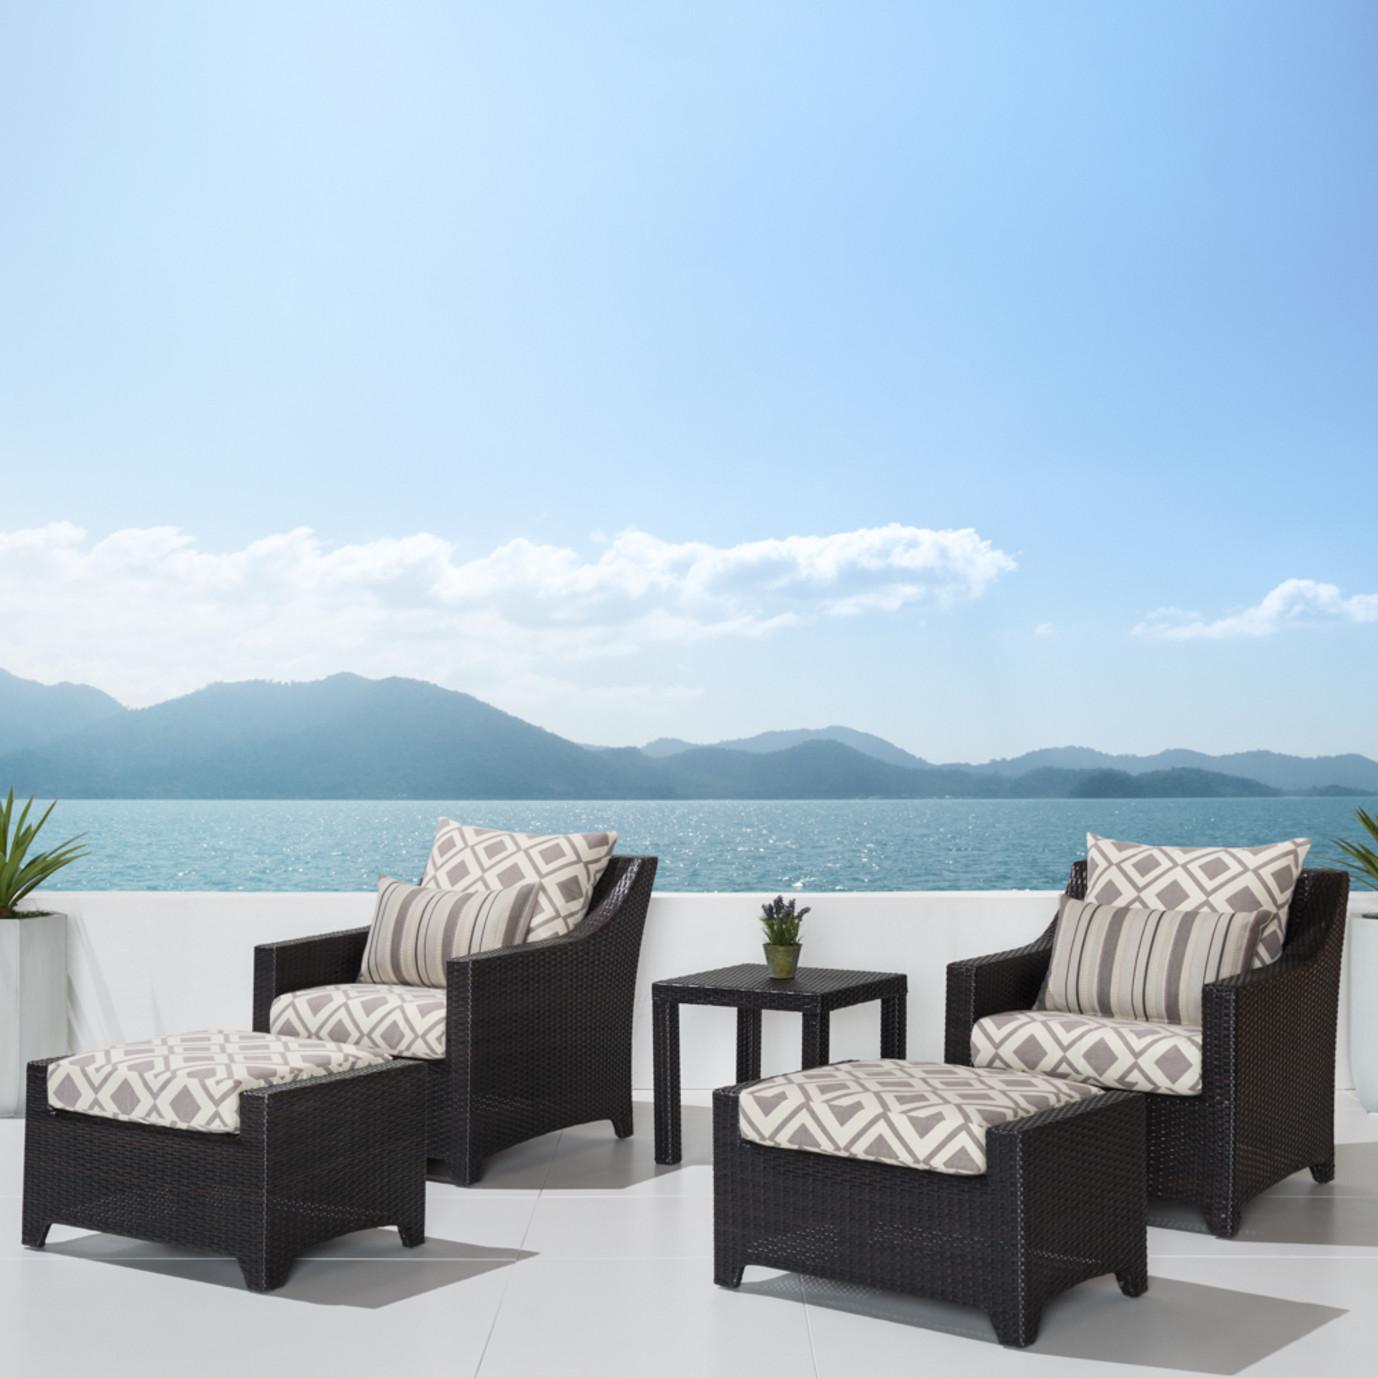 Deco™ 5pc Club Chair & Ottoman Set - Wisteria Lavender